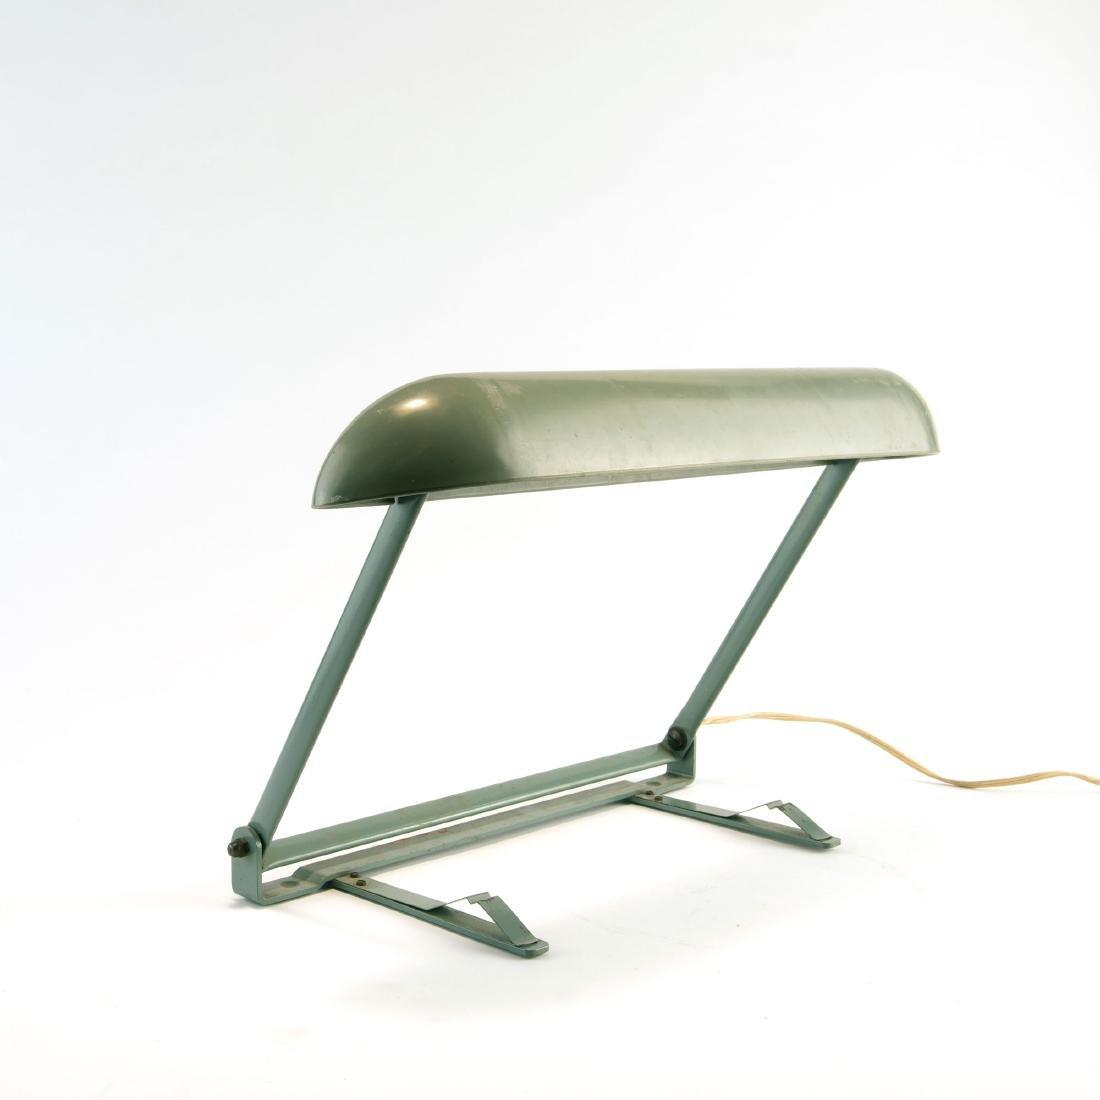 Table light /clamp light, c. 1950 - 2